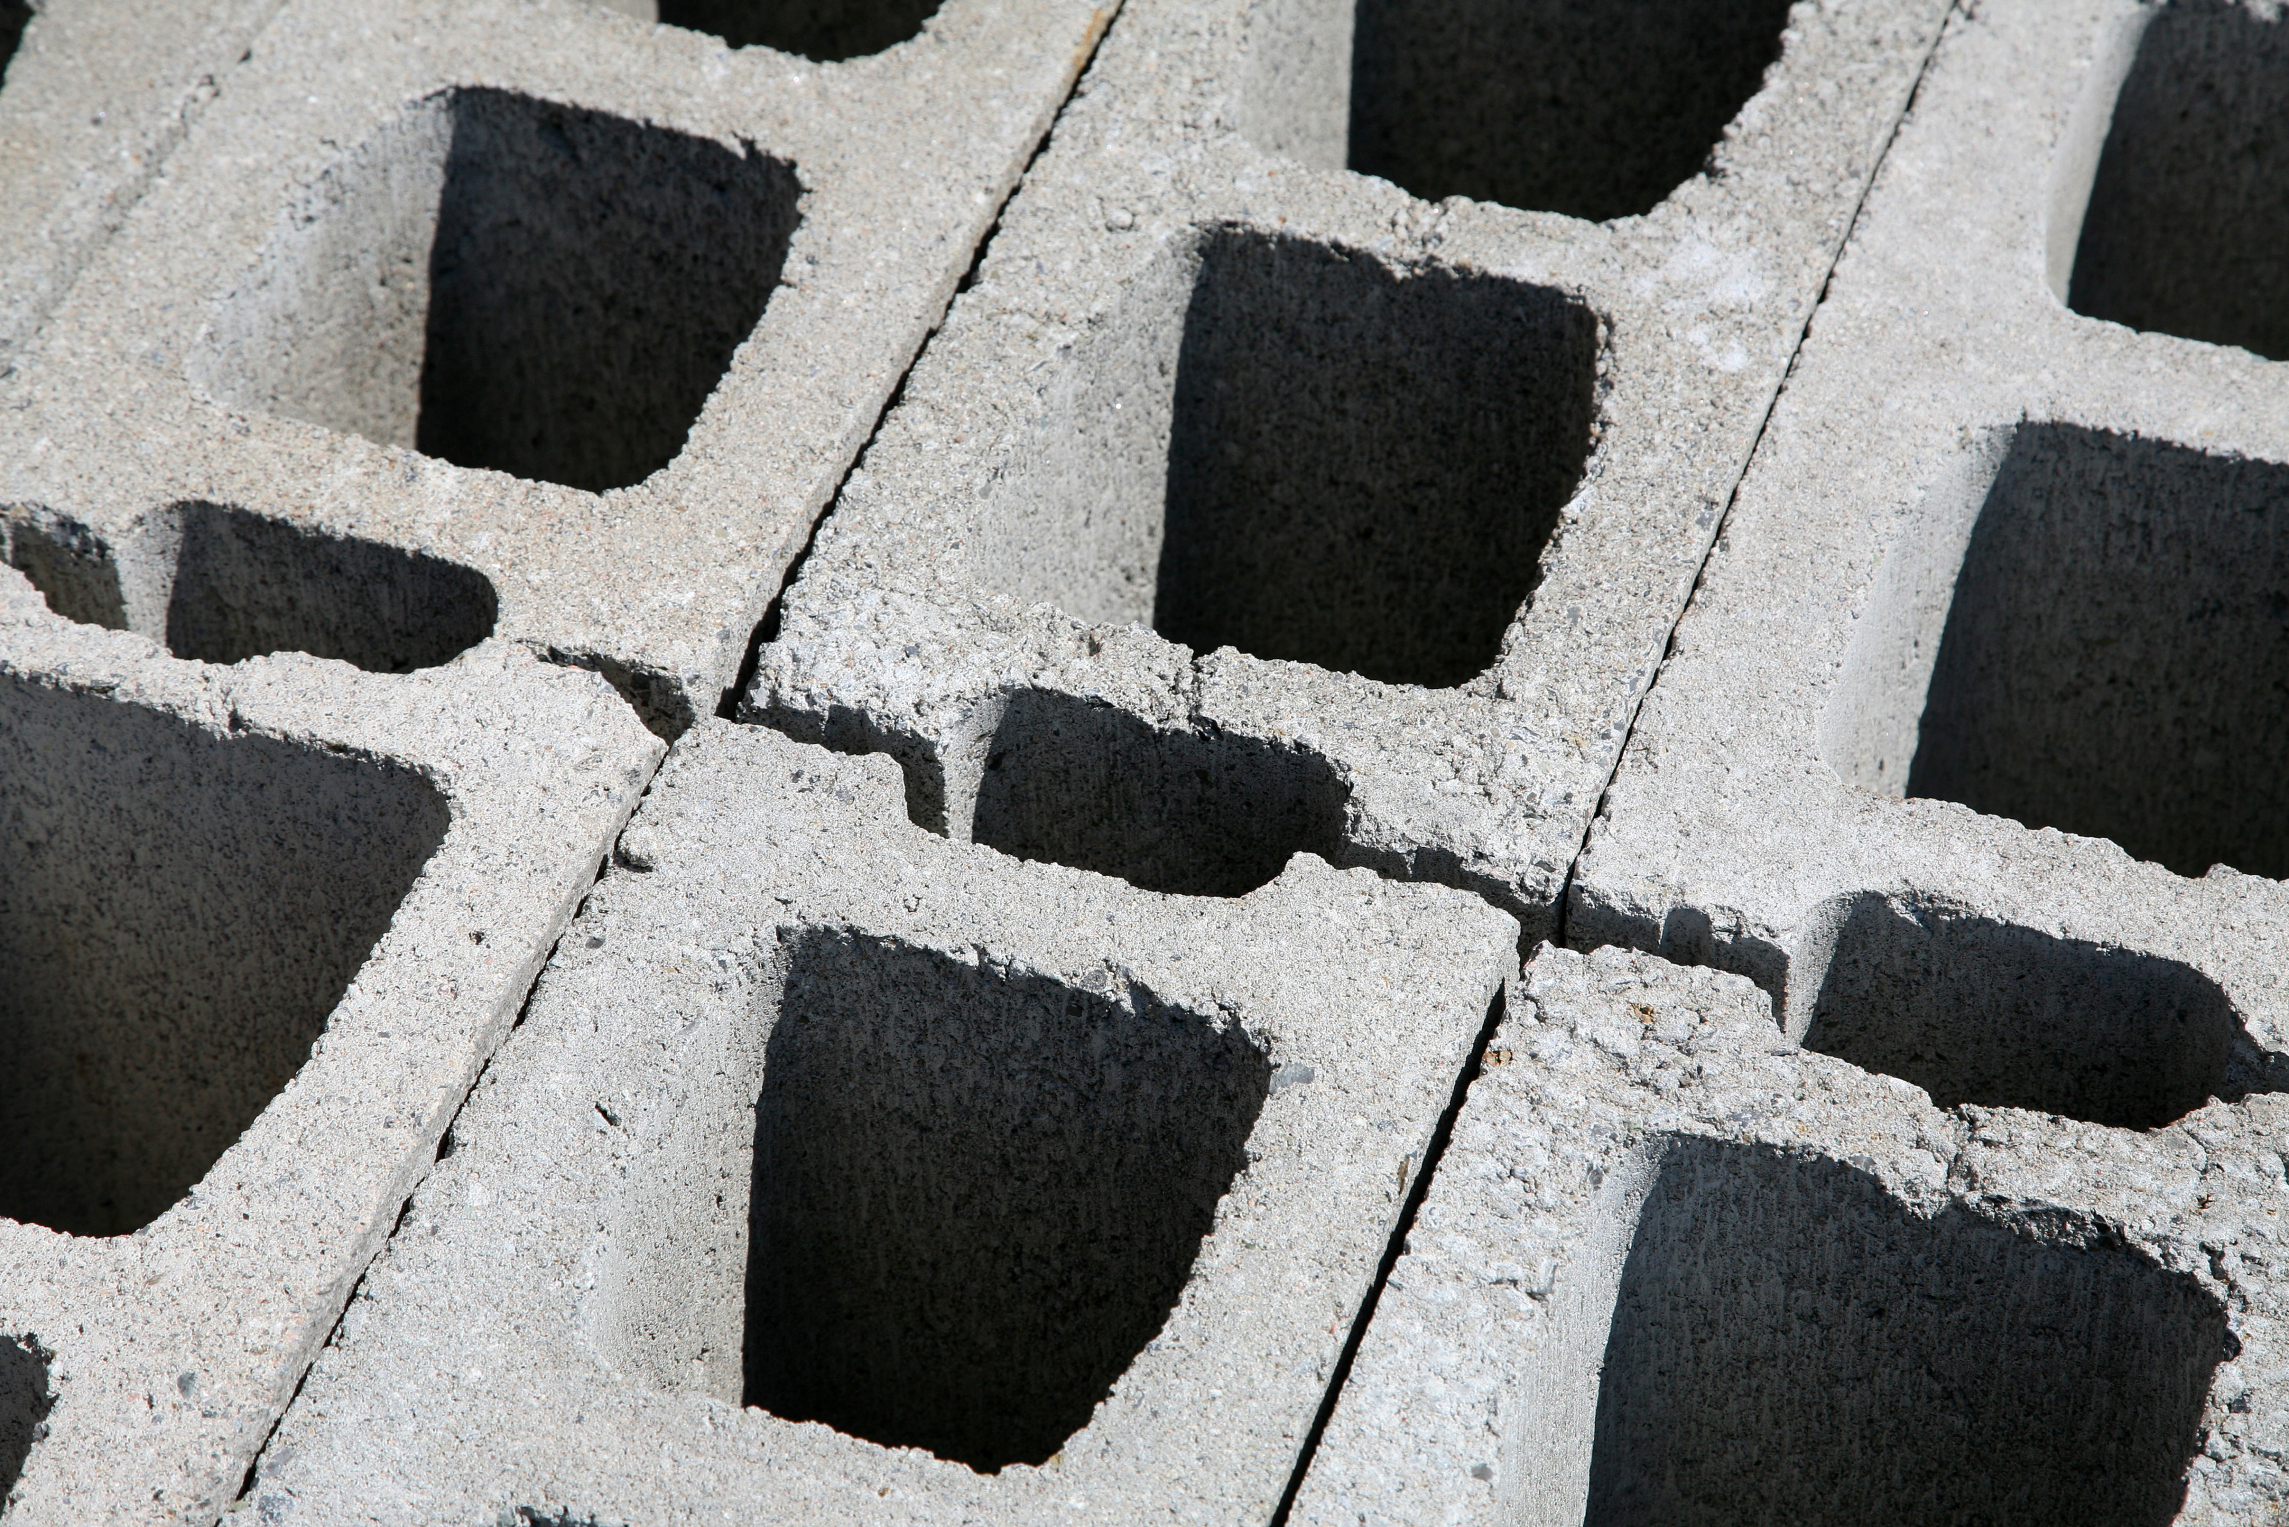 Resultado de imagen para Muros de block hueco o sólido ( de concreto)